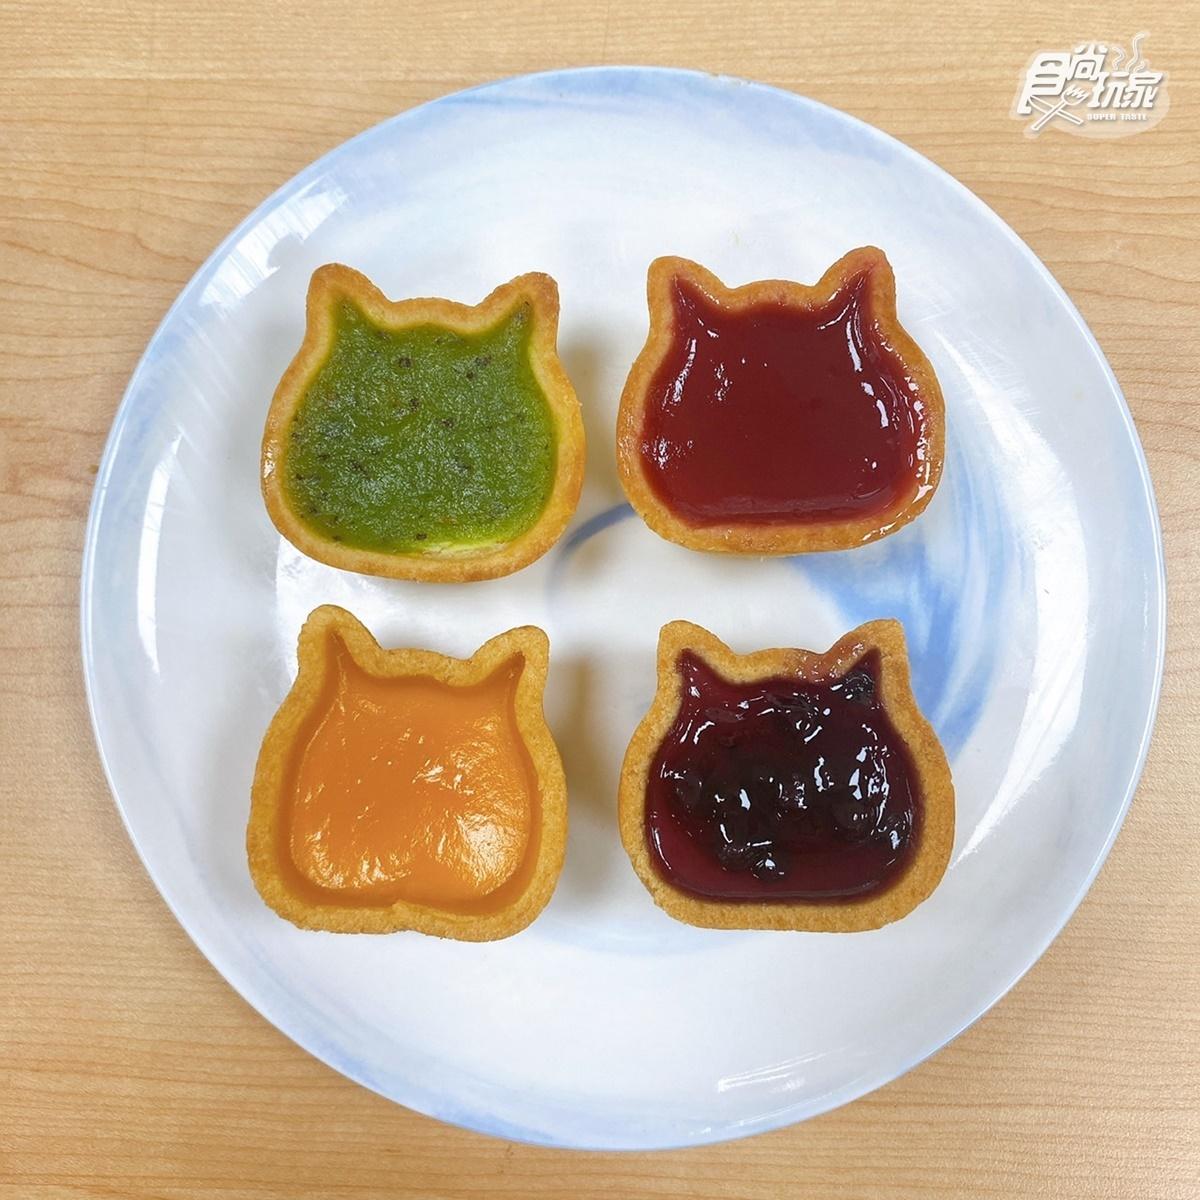 NEKO NEKO CHEESECAKE快閃台中!全台首賣「彩虹貓」4色果醬起司蛋糕必吃